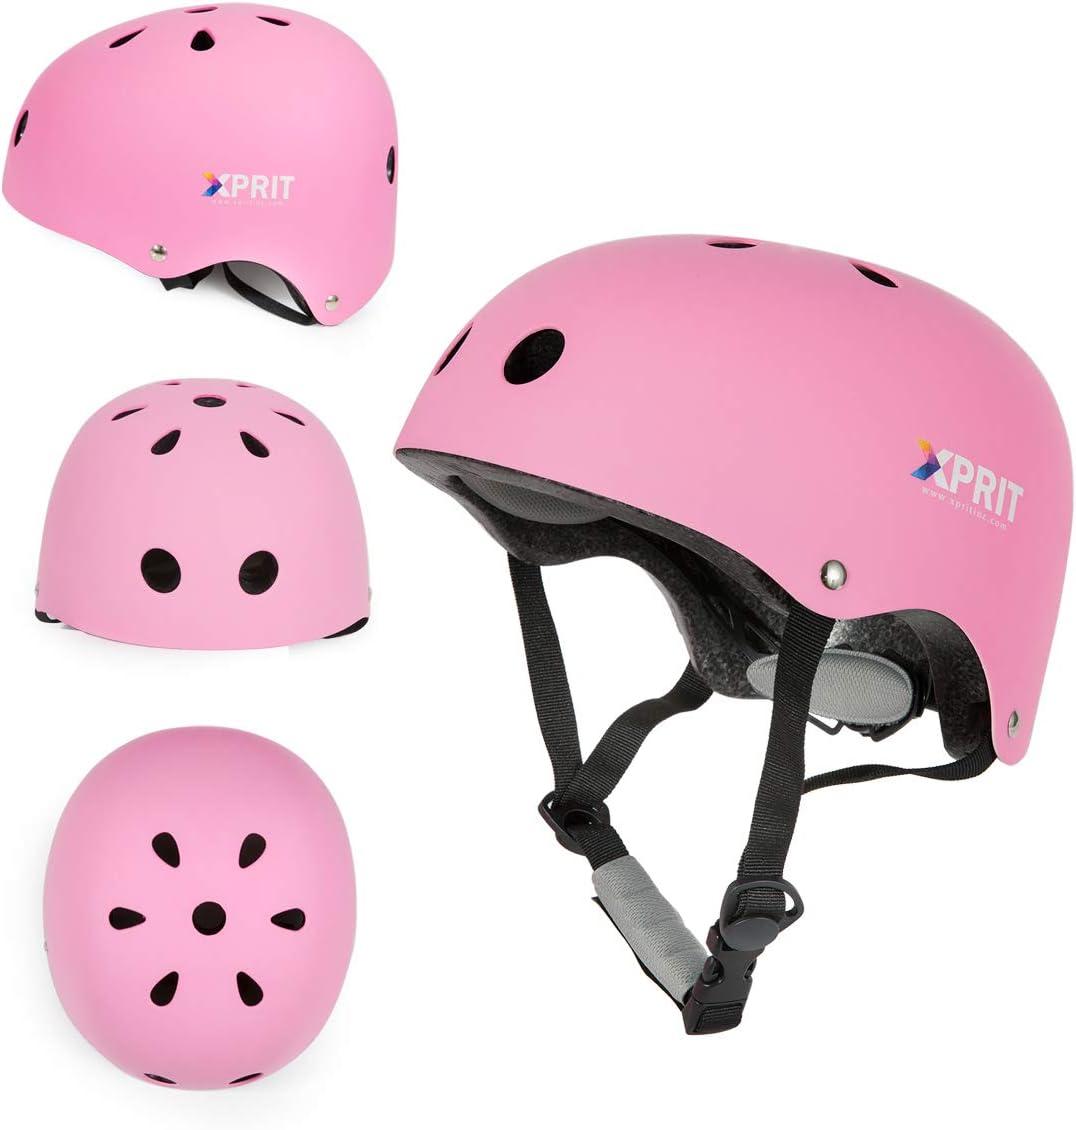 XPRIT Helmet for Kids Luxury goods Adults Skateboarding Helm Dedication Scooter Bike